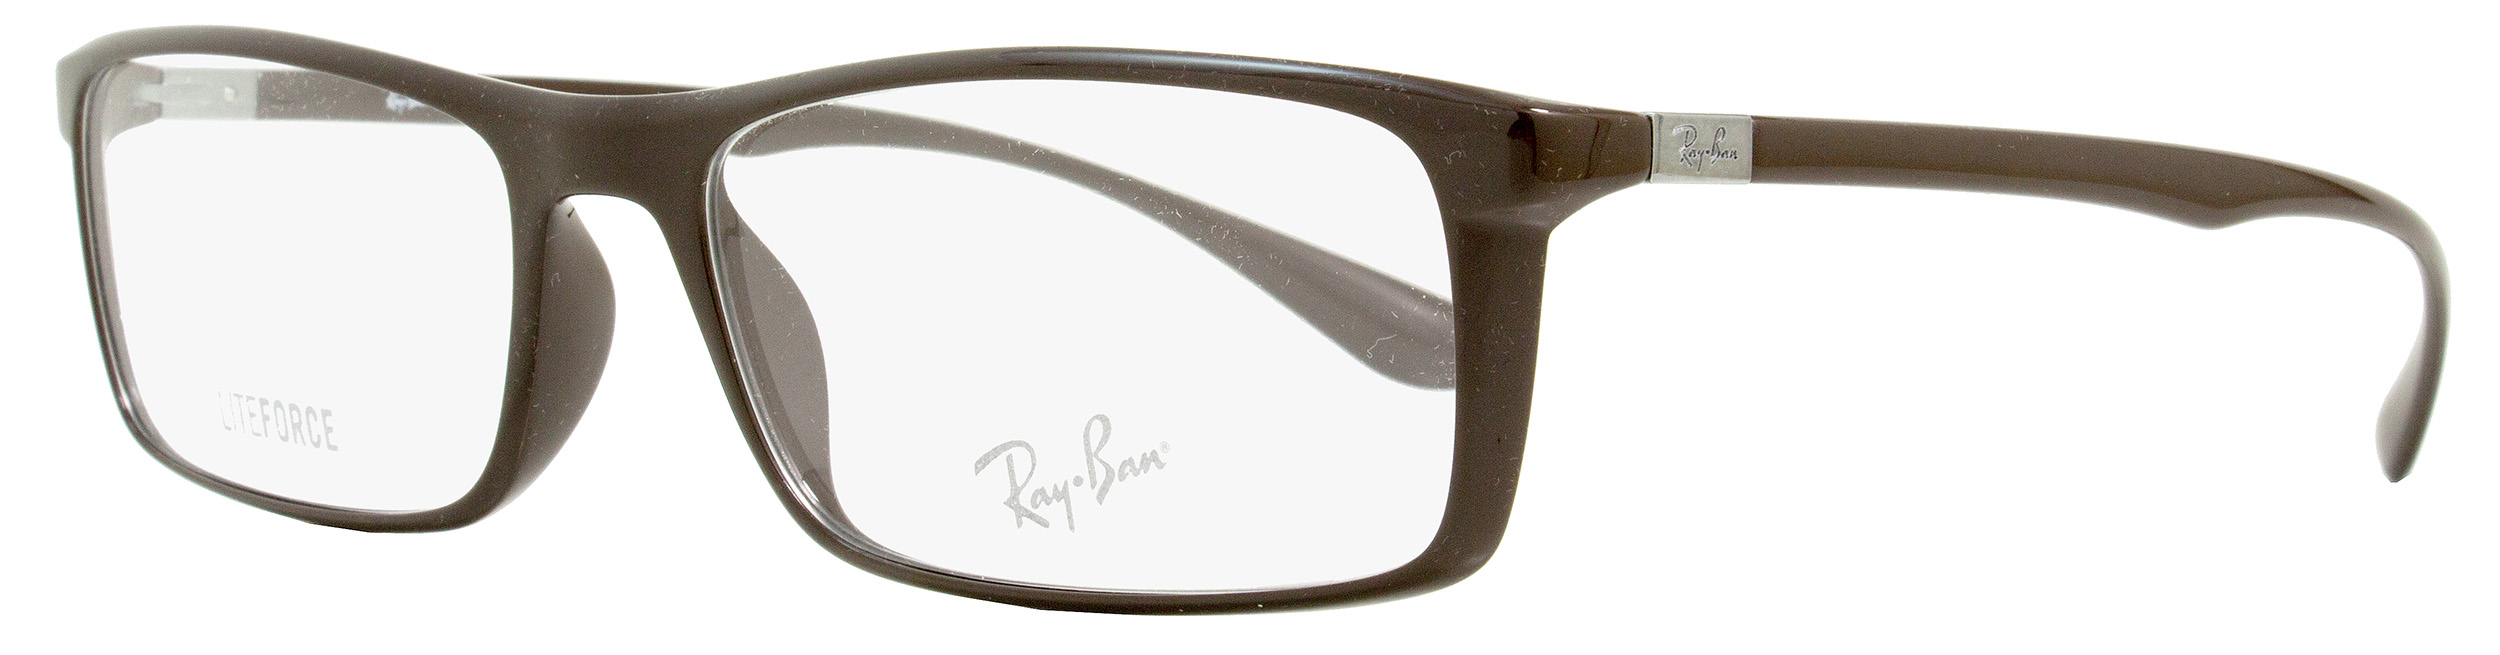 9c7bf6628e ... 7035 5434 57 17 145 brown 1698 b09ed 1ecbe  norway ray ban rectangular  eyeglasses rx7035 5434 size 57mm shiny brown 7035 07aca d88de